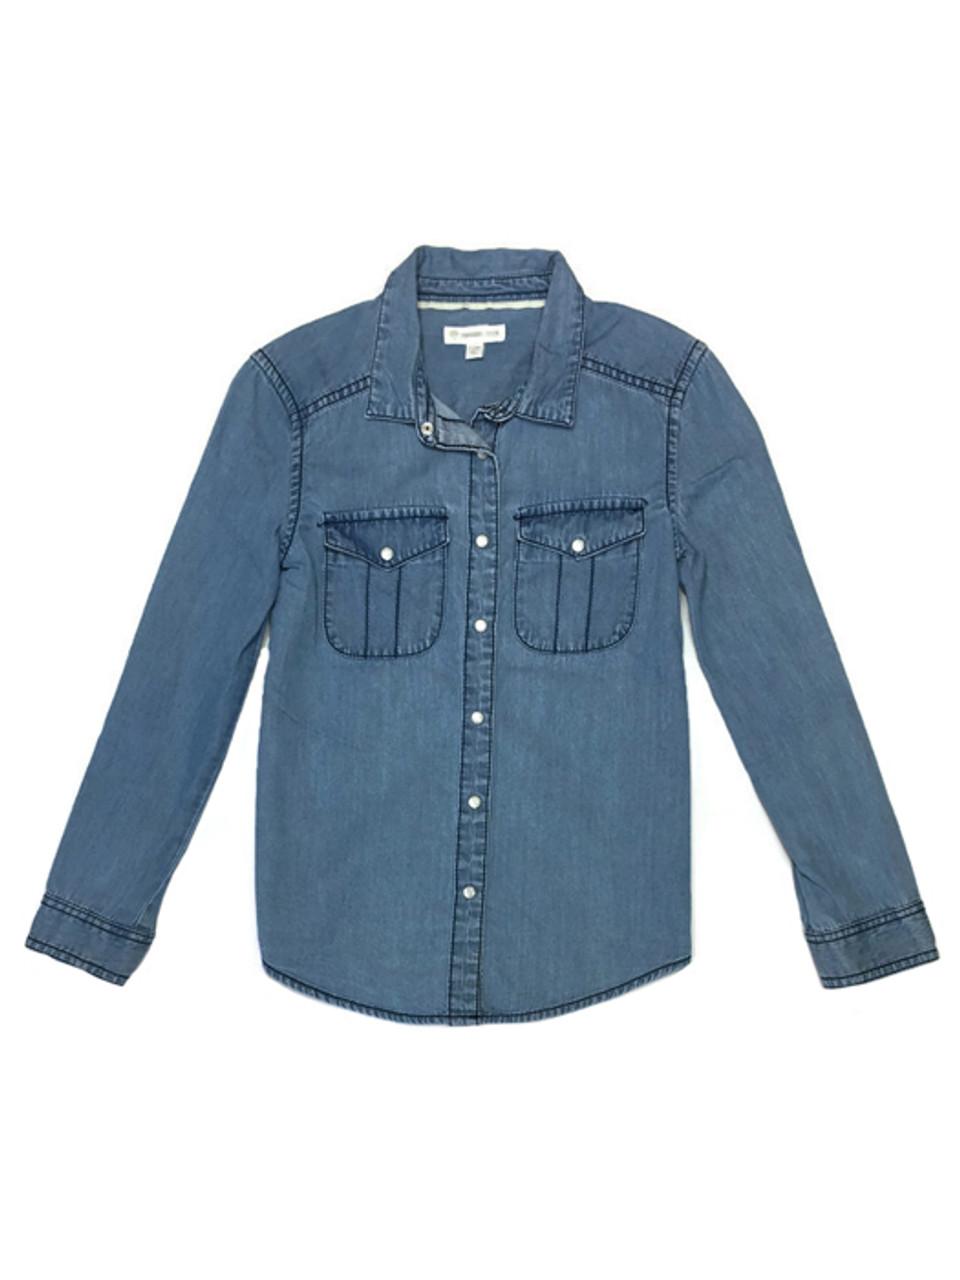 06cb3faae Tucker+Tate Girls Chambray Shirt | Berri Kids Resale Boutique